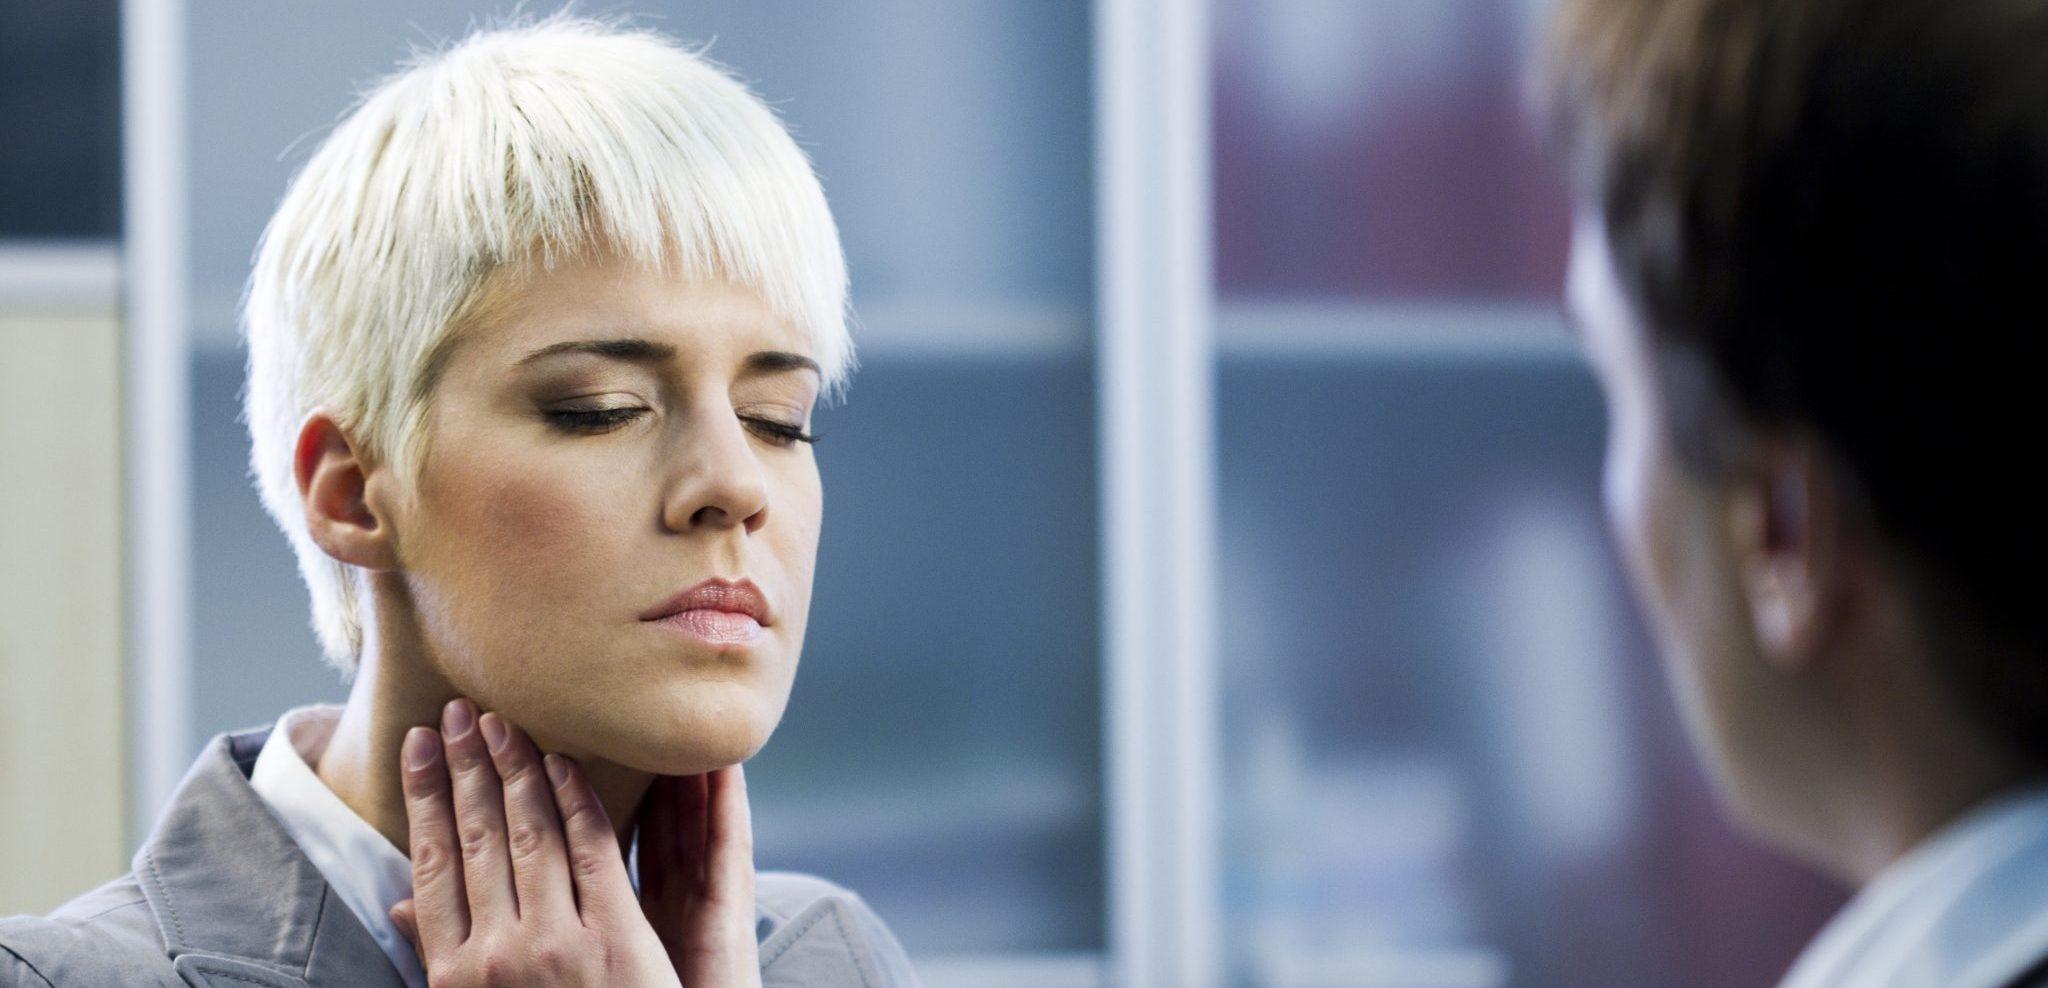 DIY Self-Lymphatic Massage – Tutorial